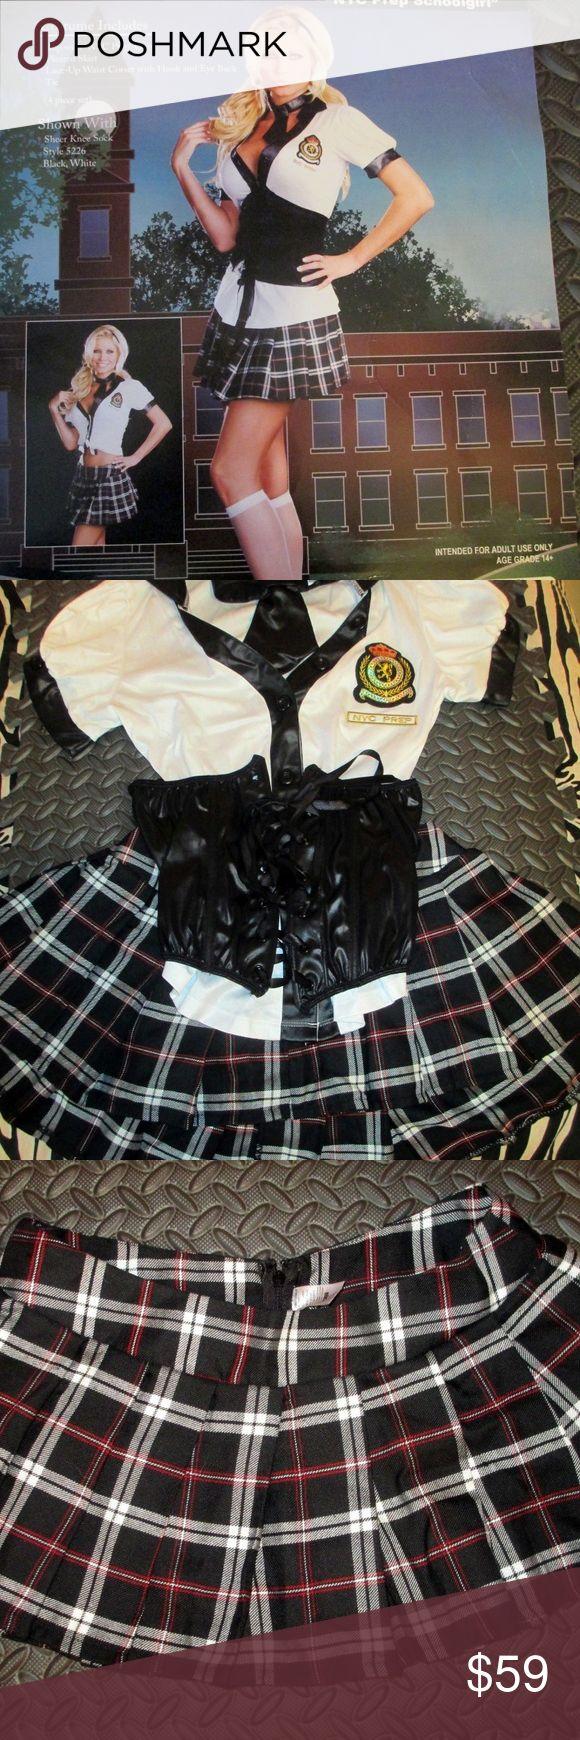 "Sexy School Girl Costume Holloween Roleplay womens SEXY SCHOOL GIRL COSTUME/ROLEPLAY BY DREAMGIRL ""NYC PREP SCHOOLGIRL"" SIZE SMALL DREAMGIRL Skirts Mini"